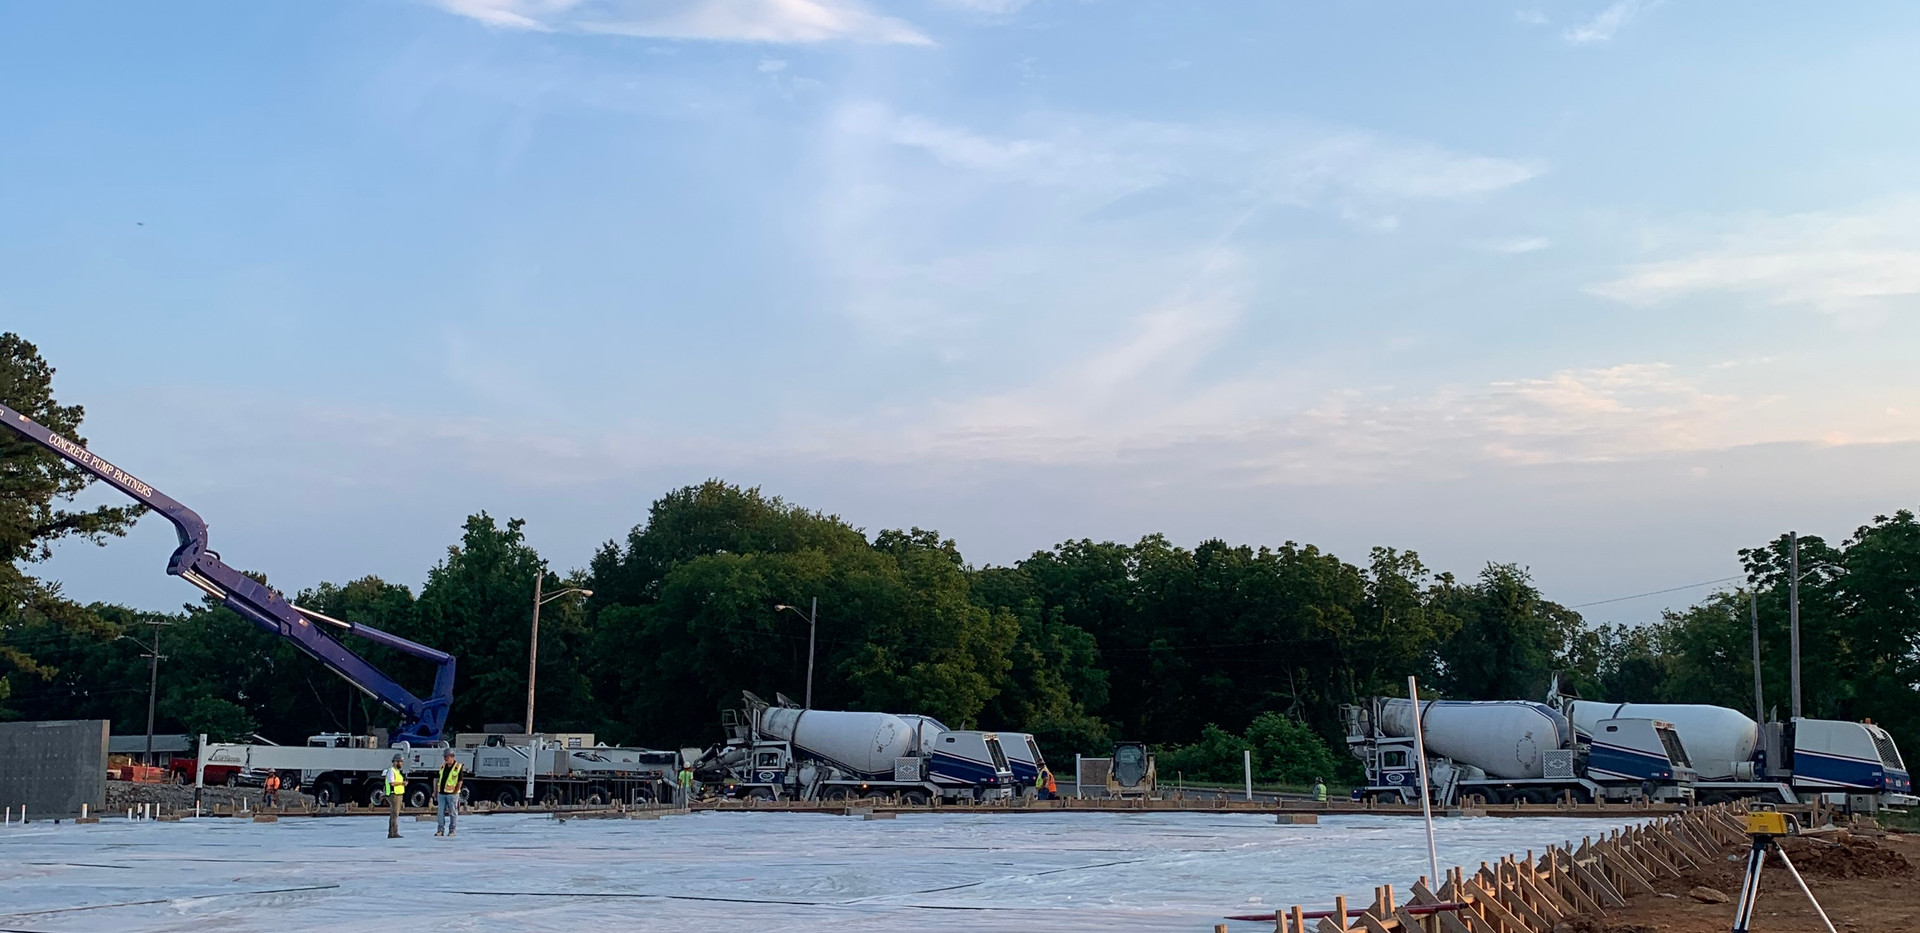 Pyles Concrete Mixer Trucks Lined Up.